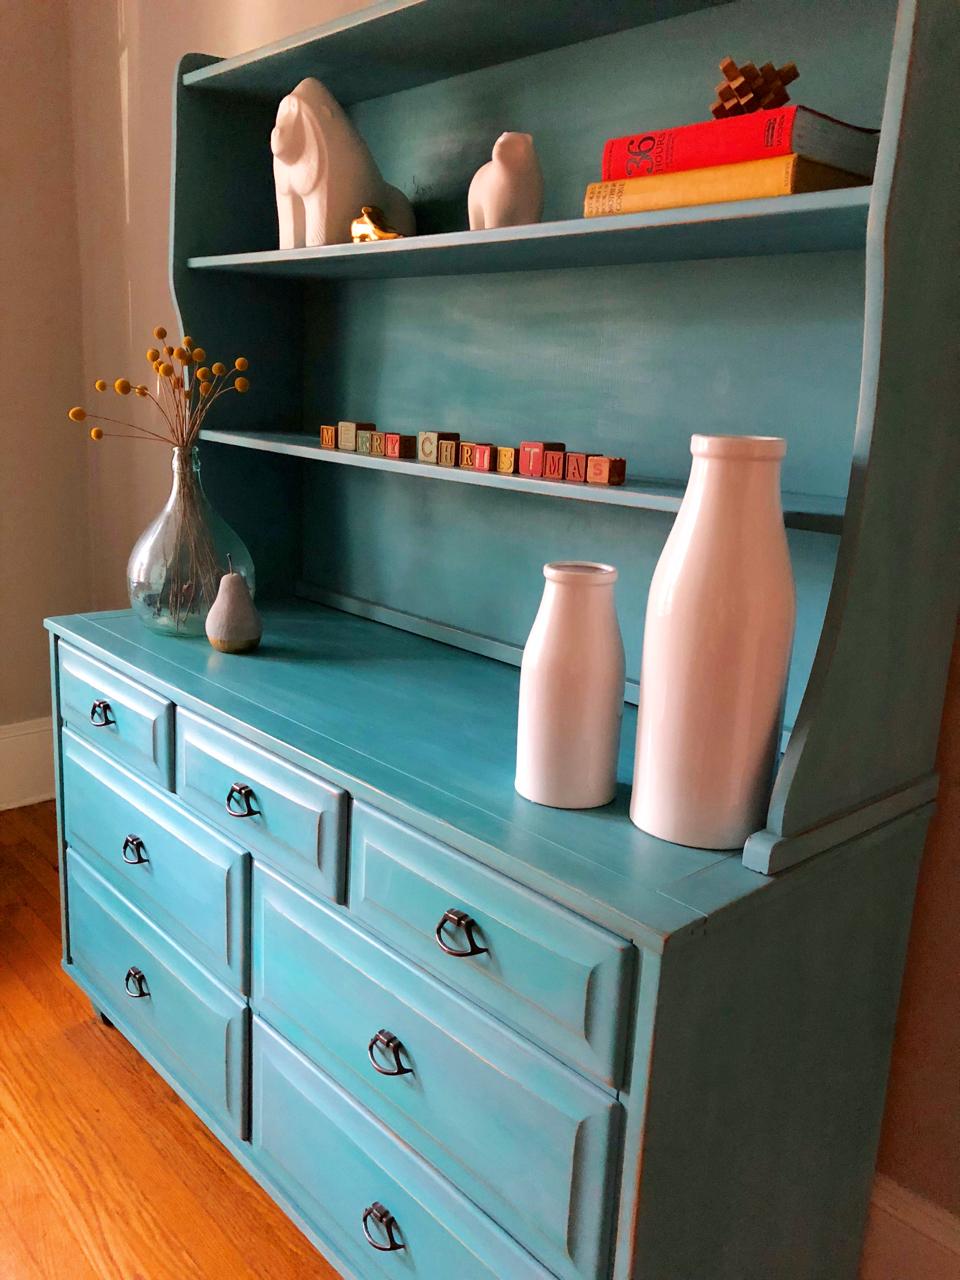 jo-torrijos-a-simpler-design-atlanta-painted-furniture-turquoise-buffet-hutch-5.jpg